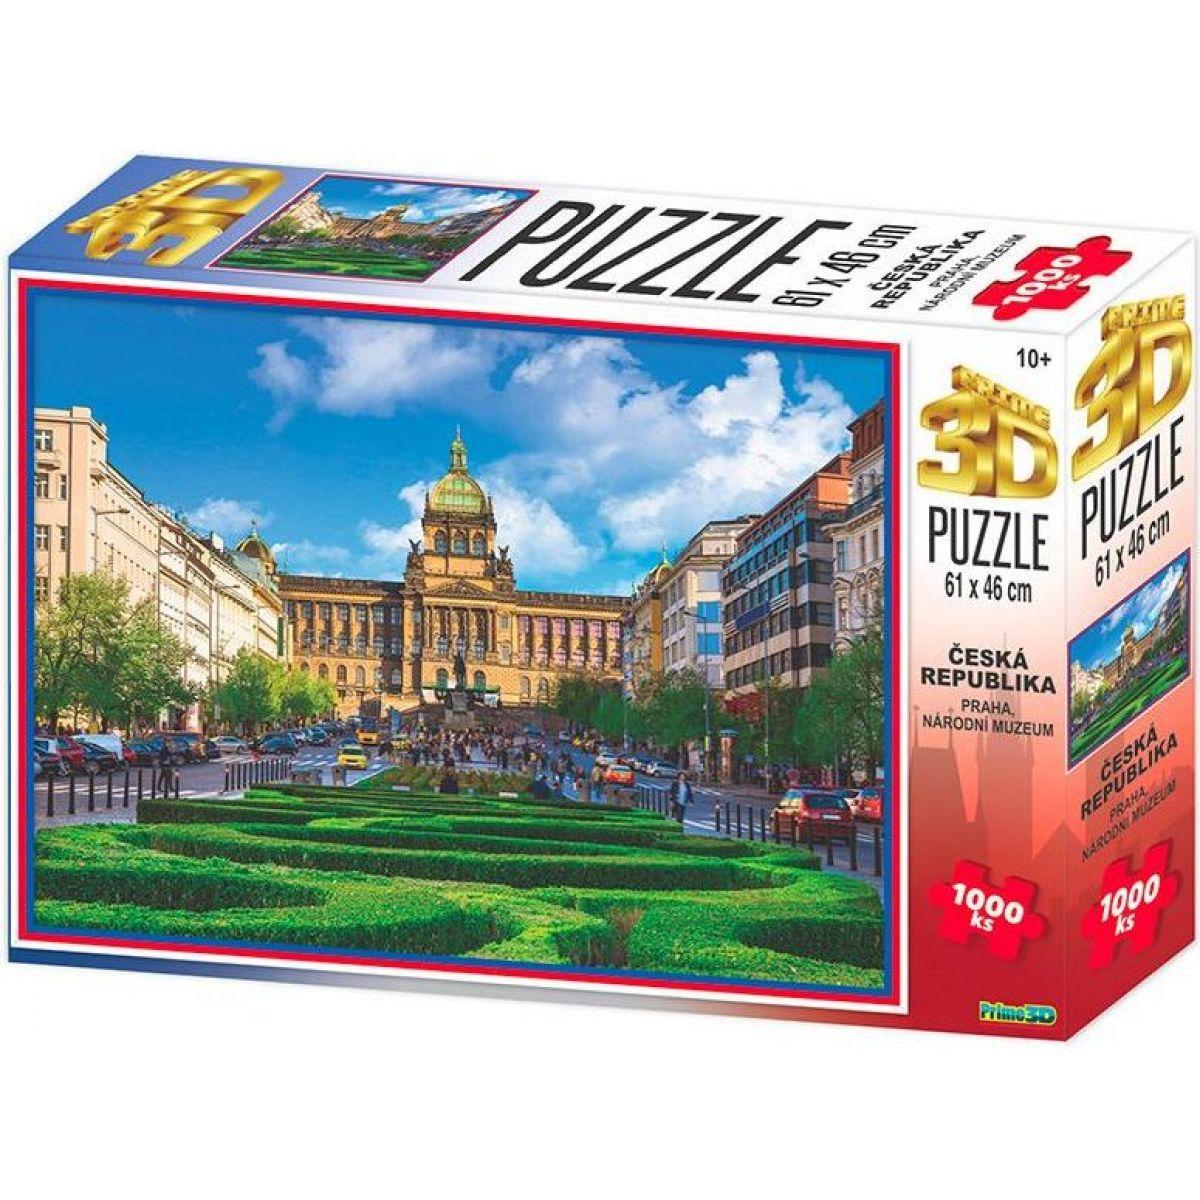 HM Studio 3D puzzle Praha Národní Muzeum 1000 KS